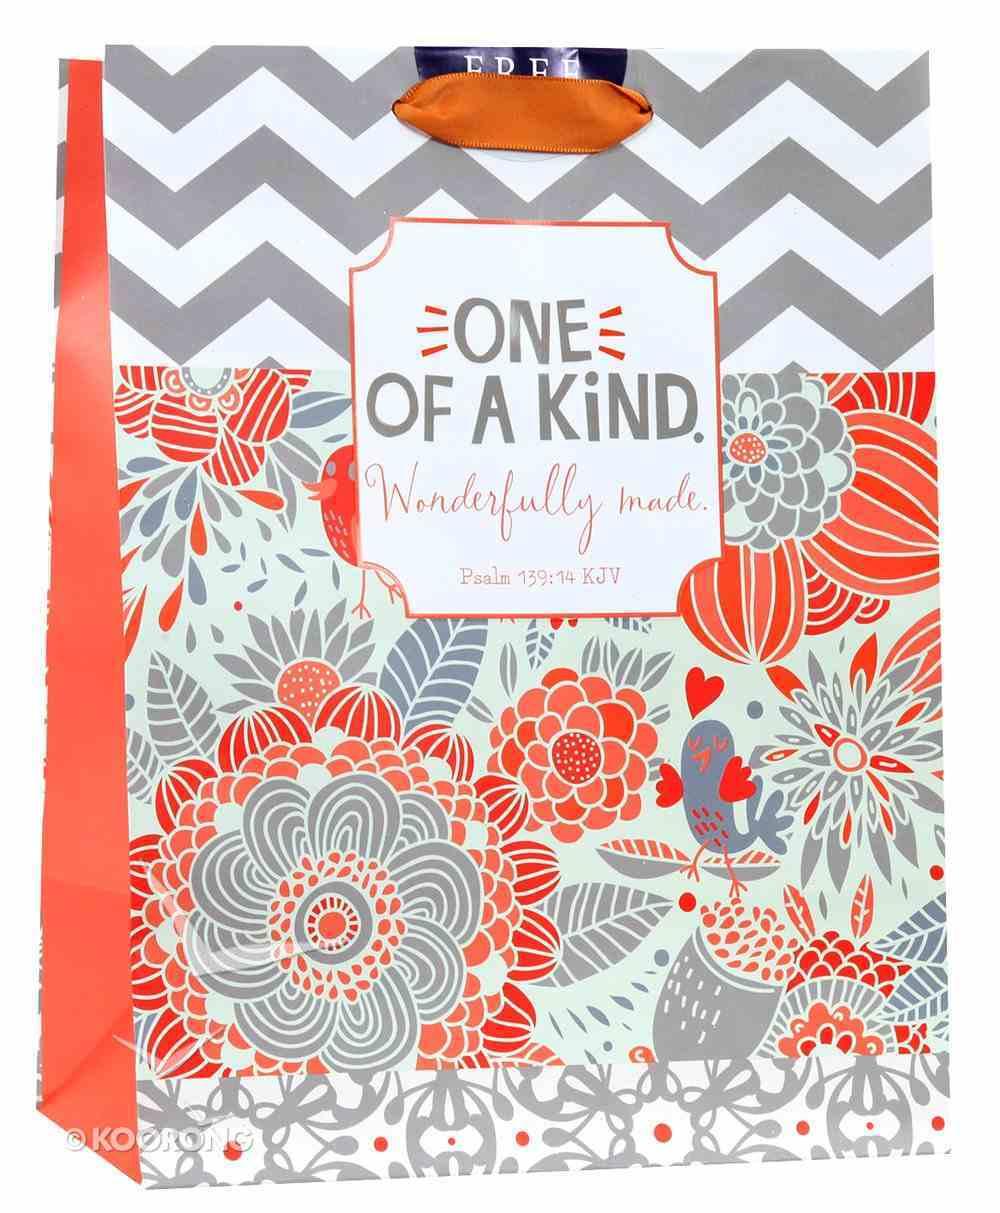 Gift Bag Medium: One of a Kind (Psalm 139:14 Kjv) Stationery